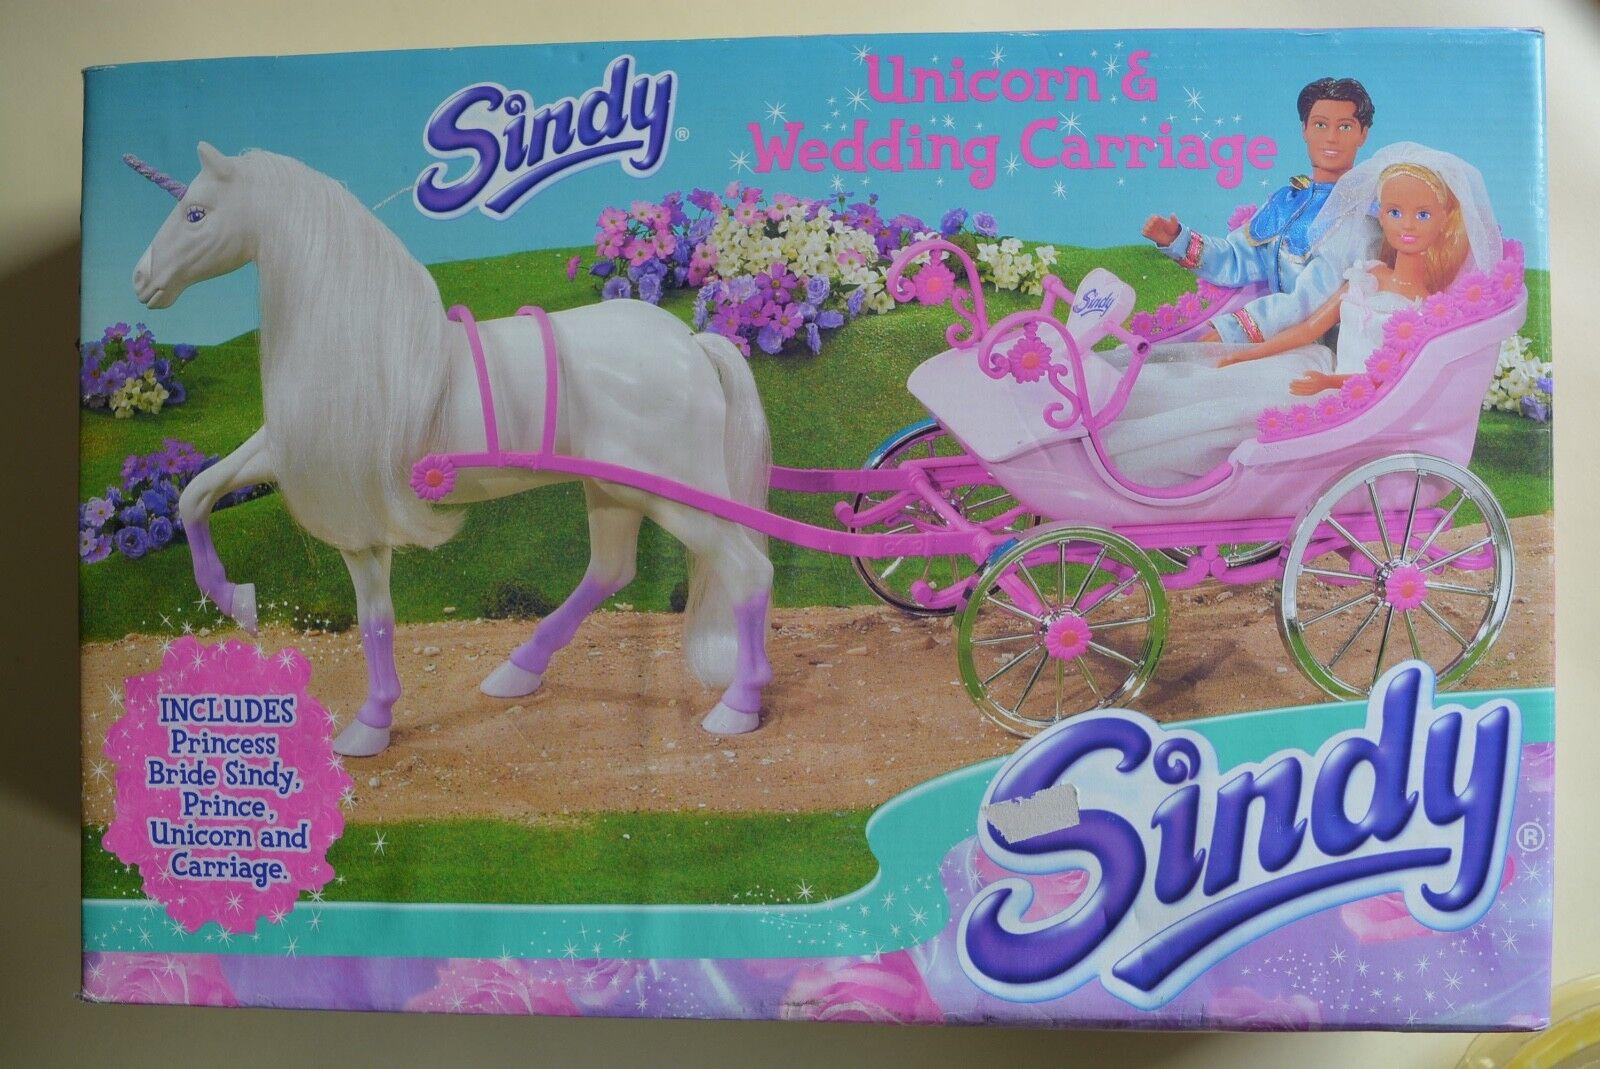 Sindy Unicorn Wedding Carriage Bride & Groom Vivid Imaginations 2003 Unused Box